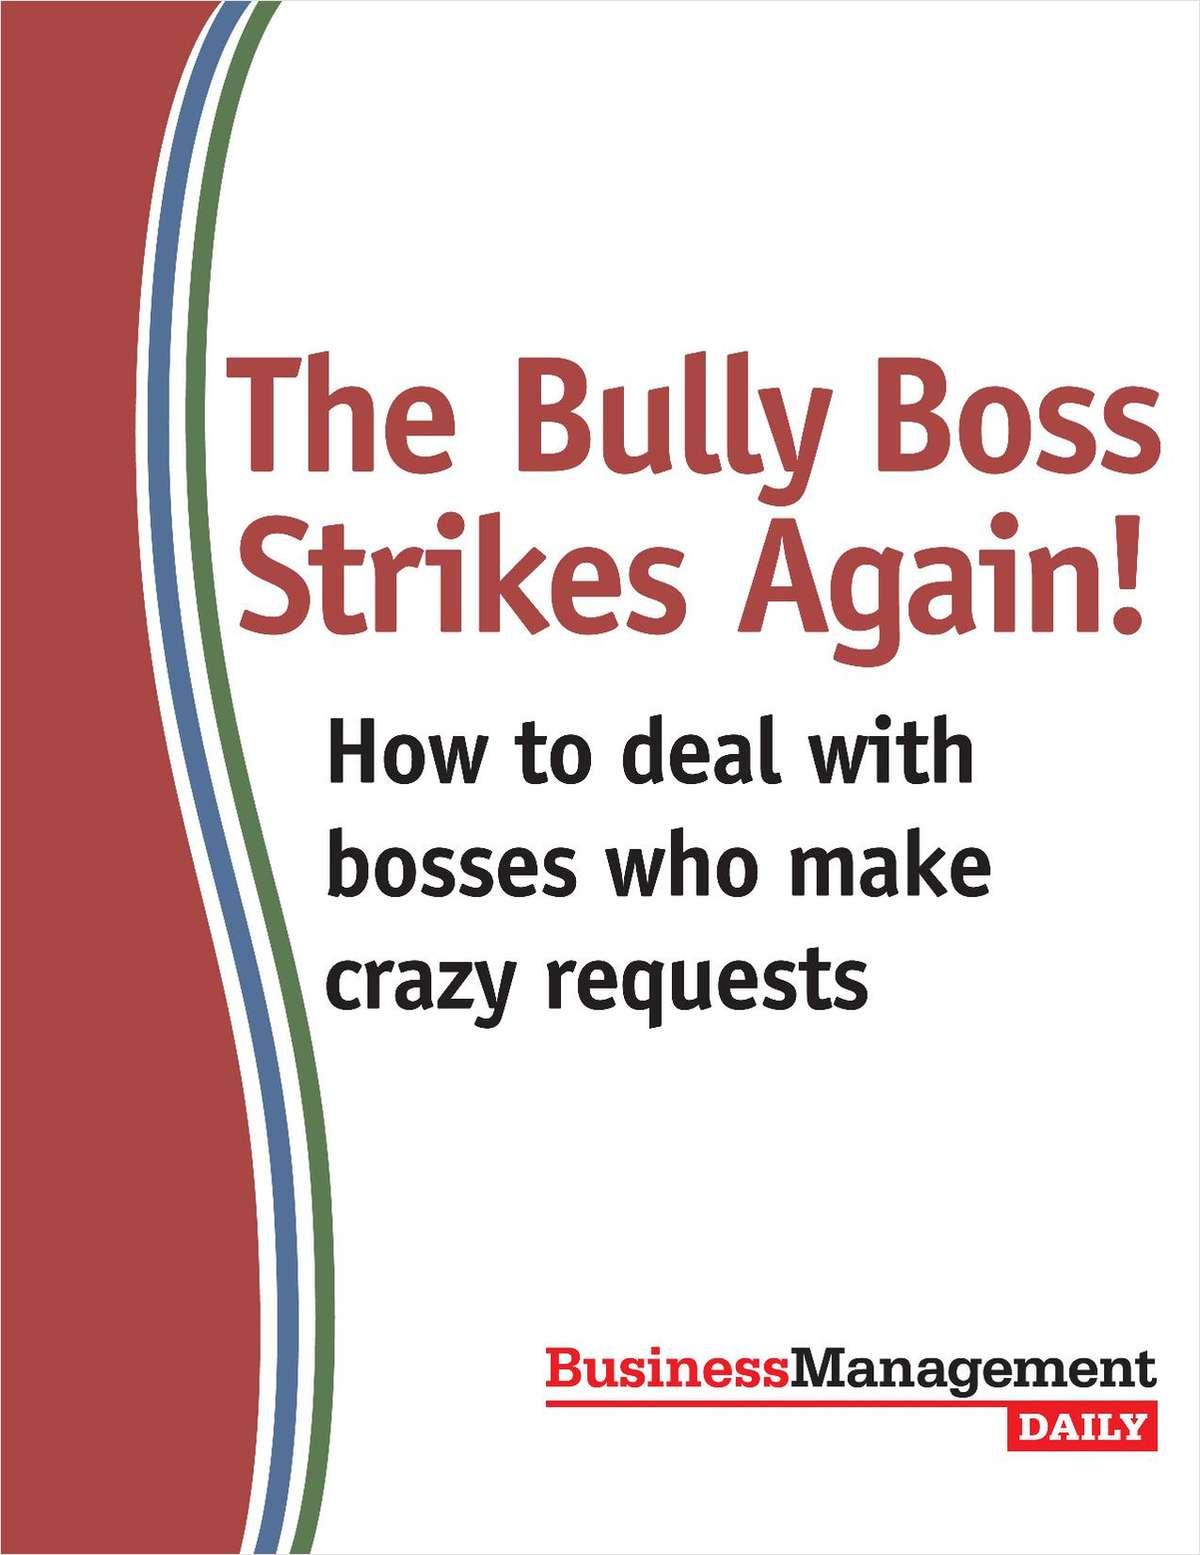 The Bully Boss Strikes Again!